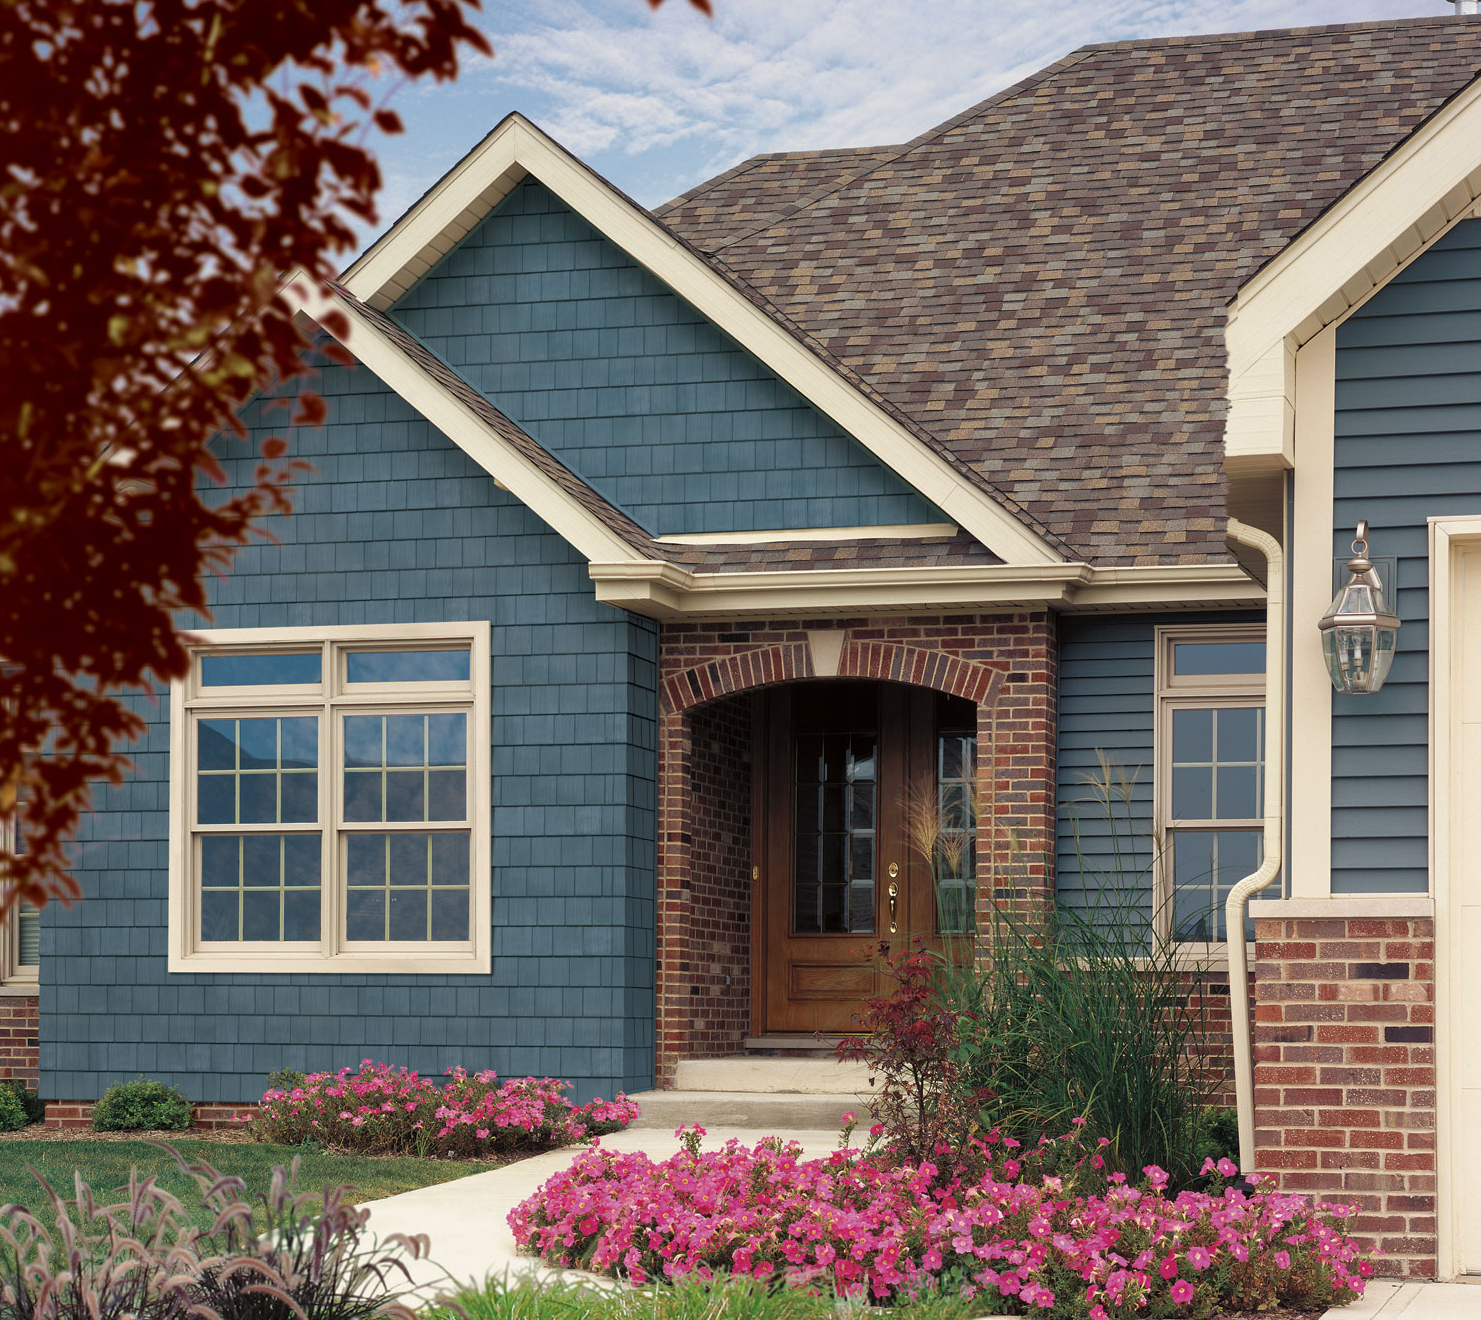 Siding Options for Homes - HomesFeed on Siding Ideas  id=95740